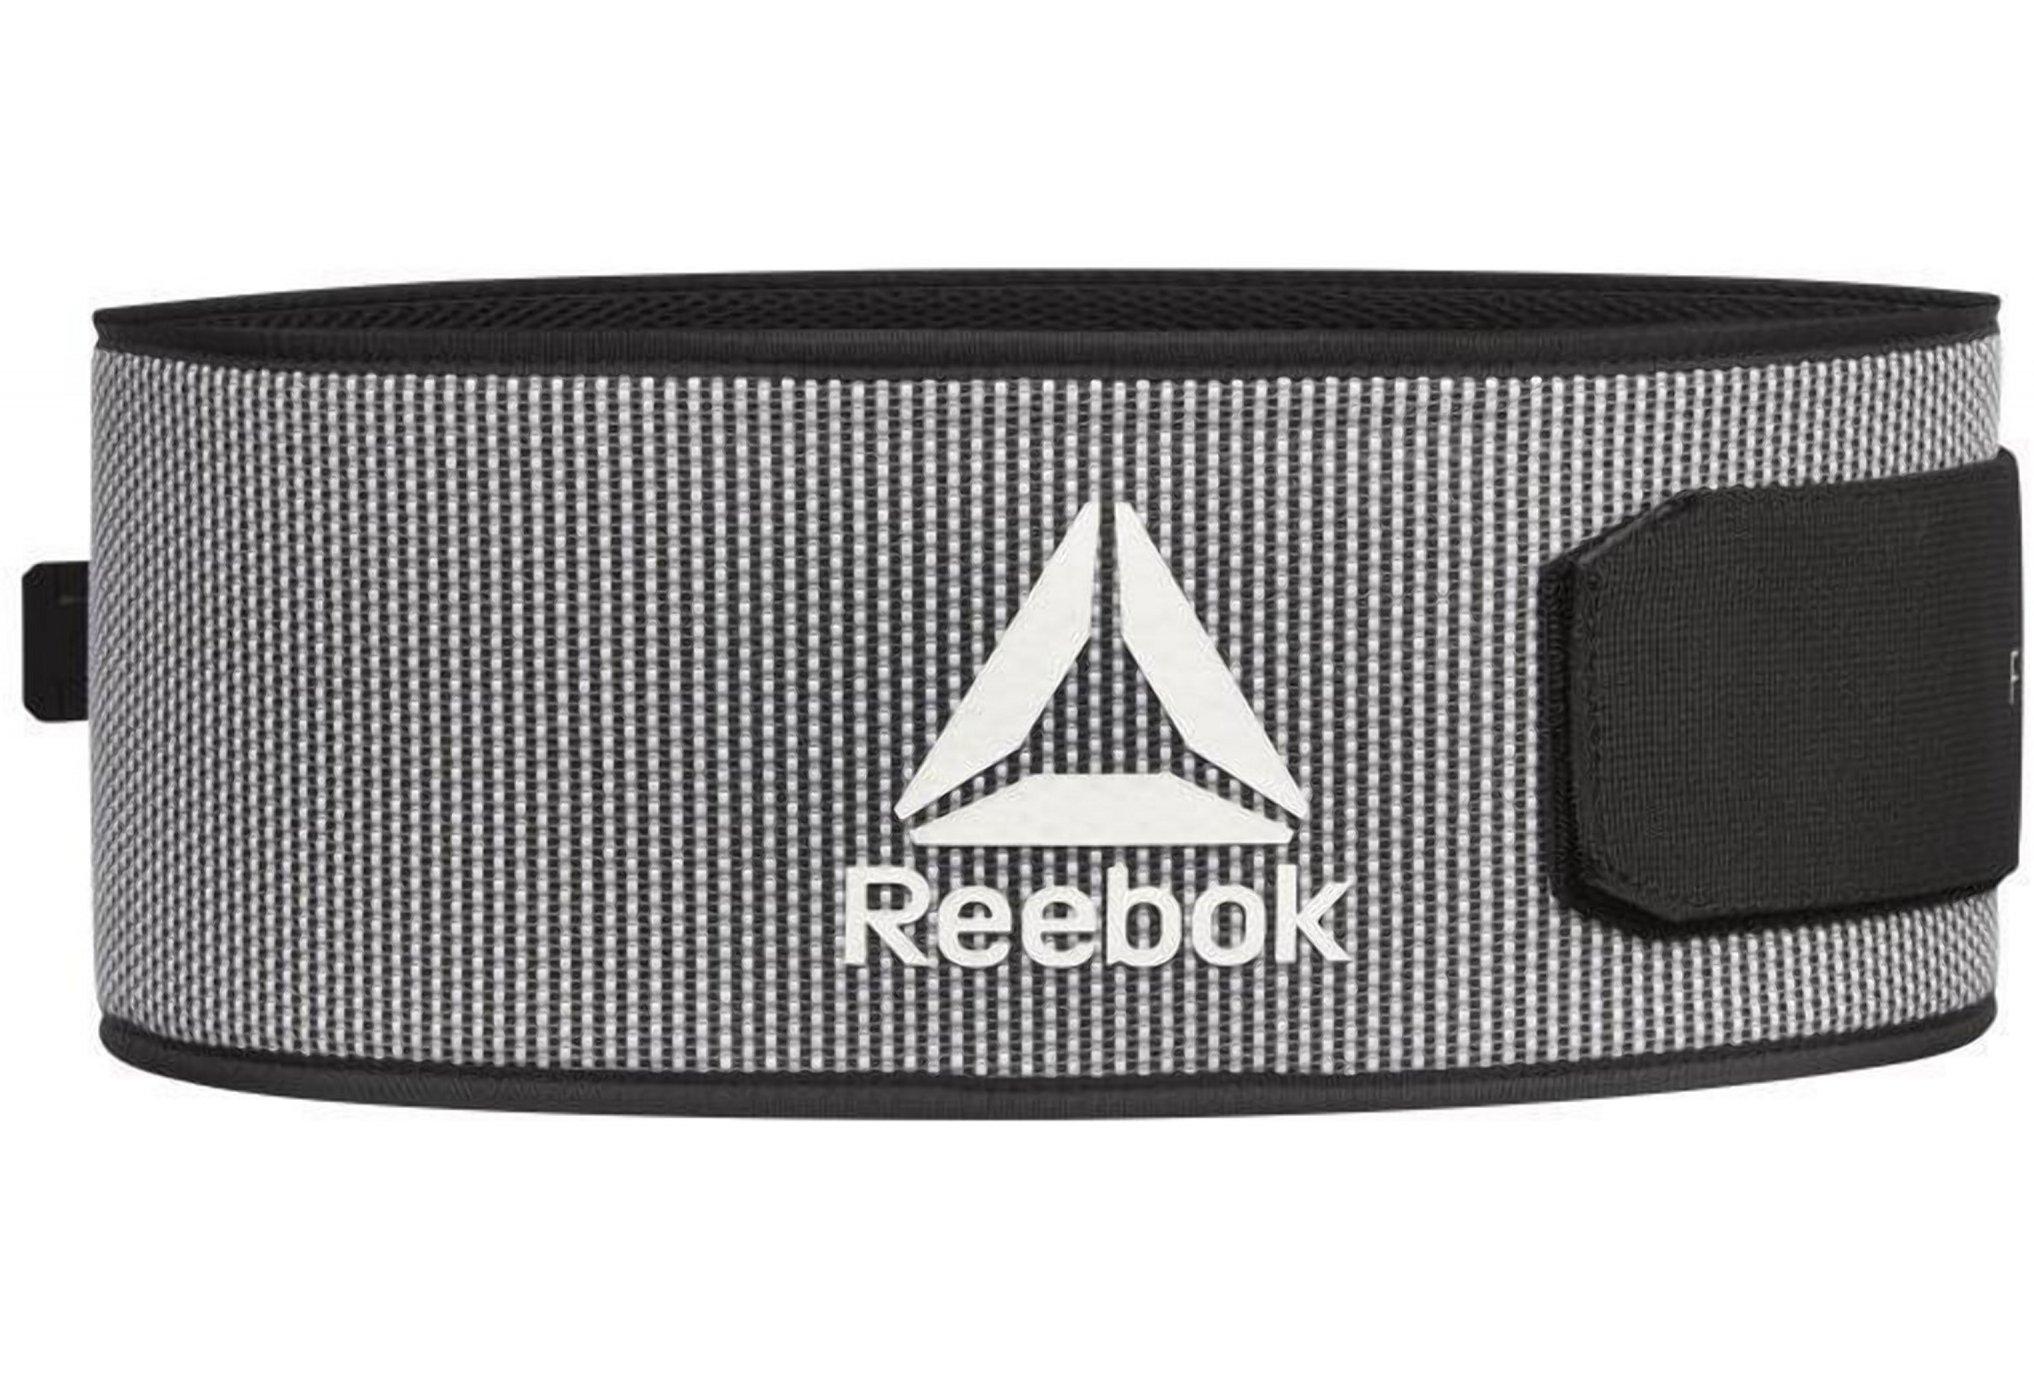 Reebok Flexweave Power Lifting Belt Training